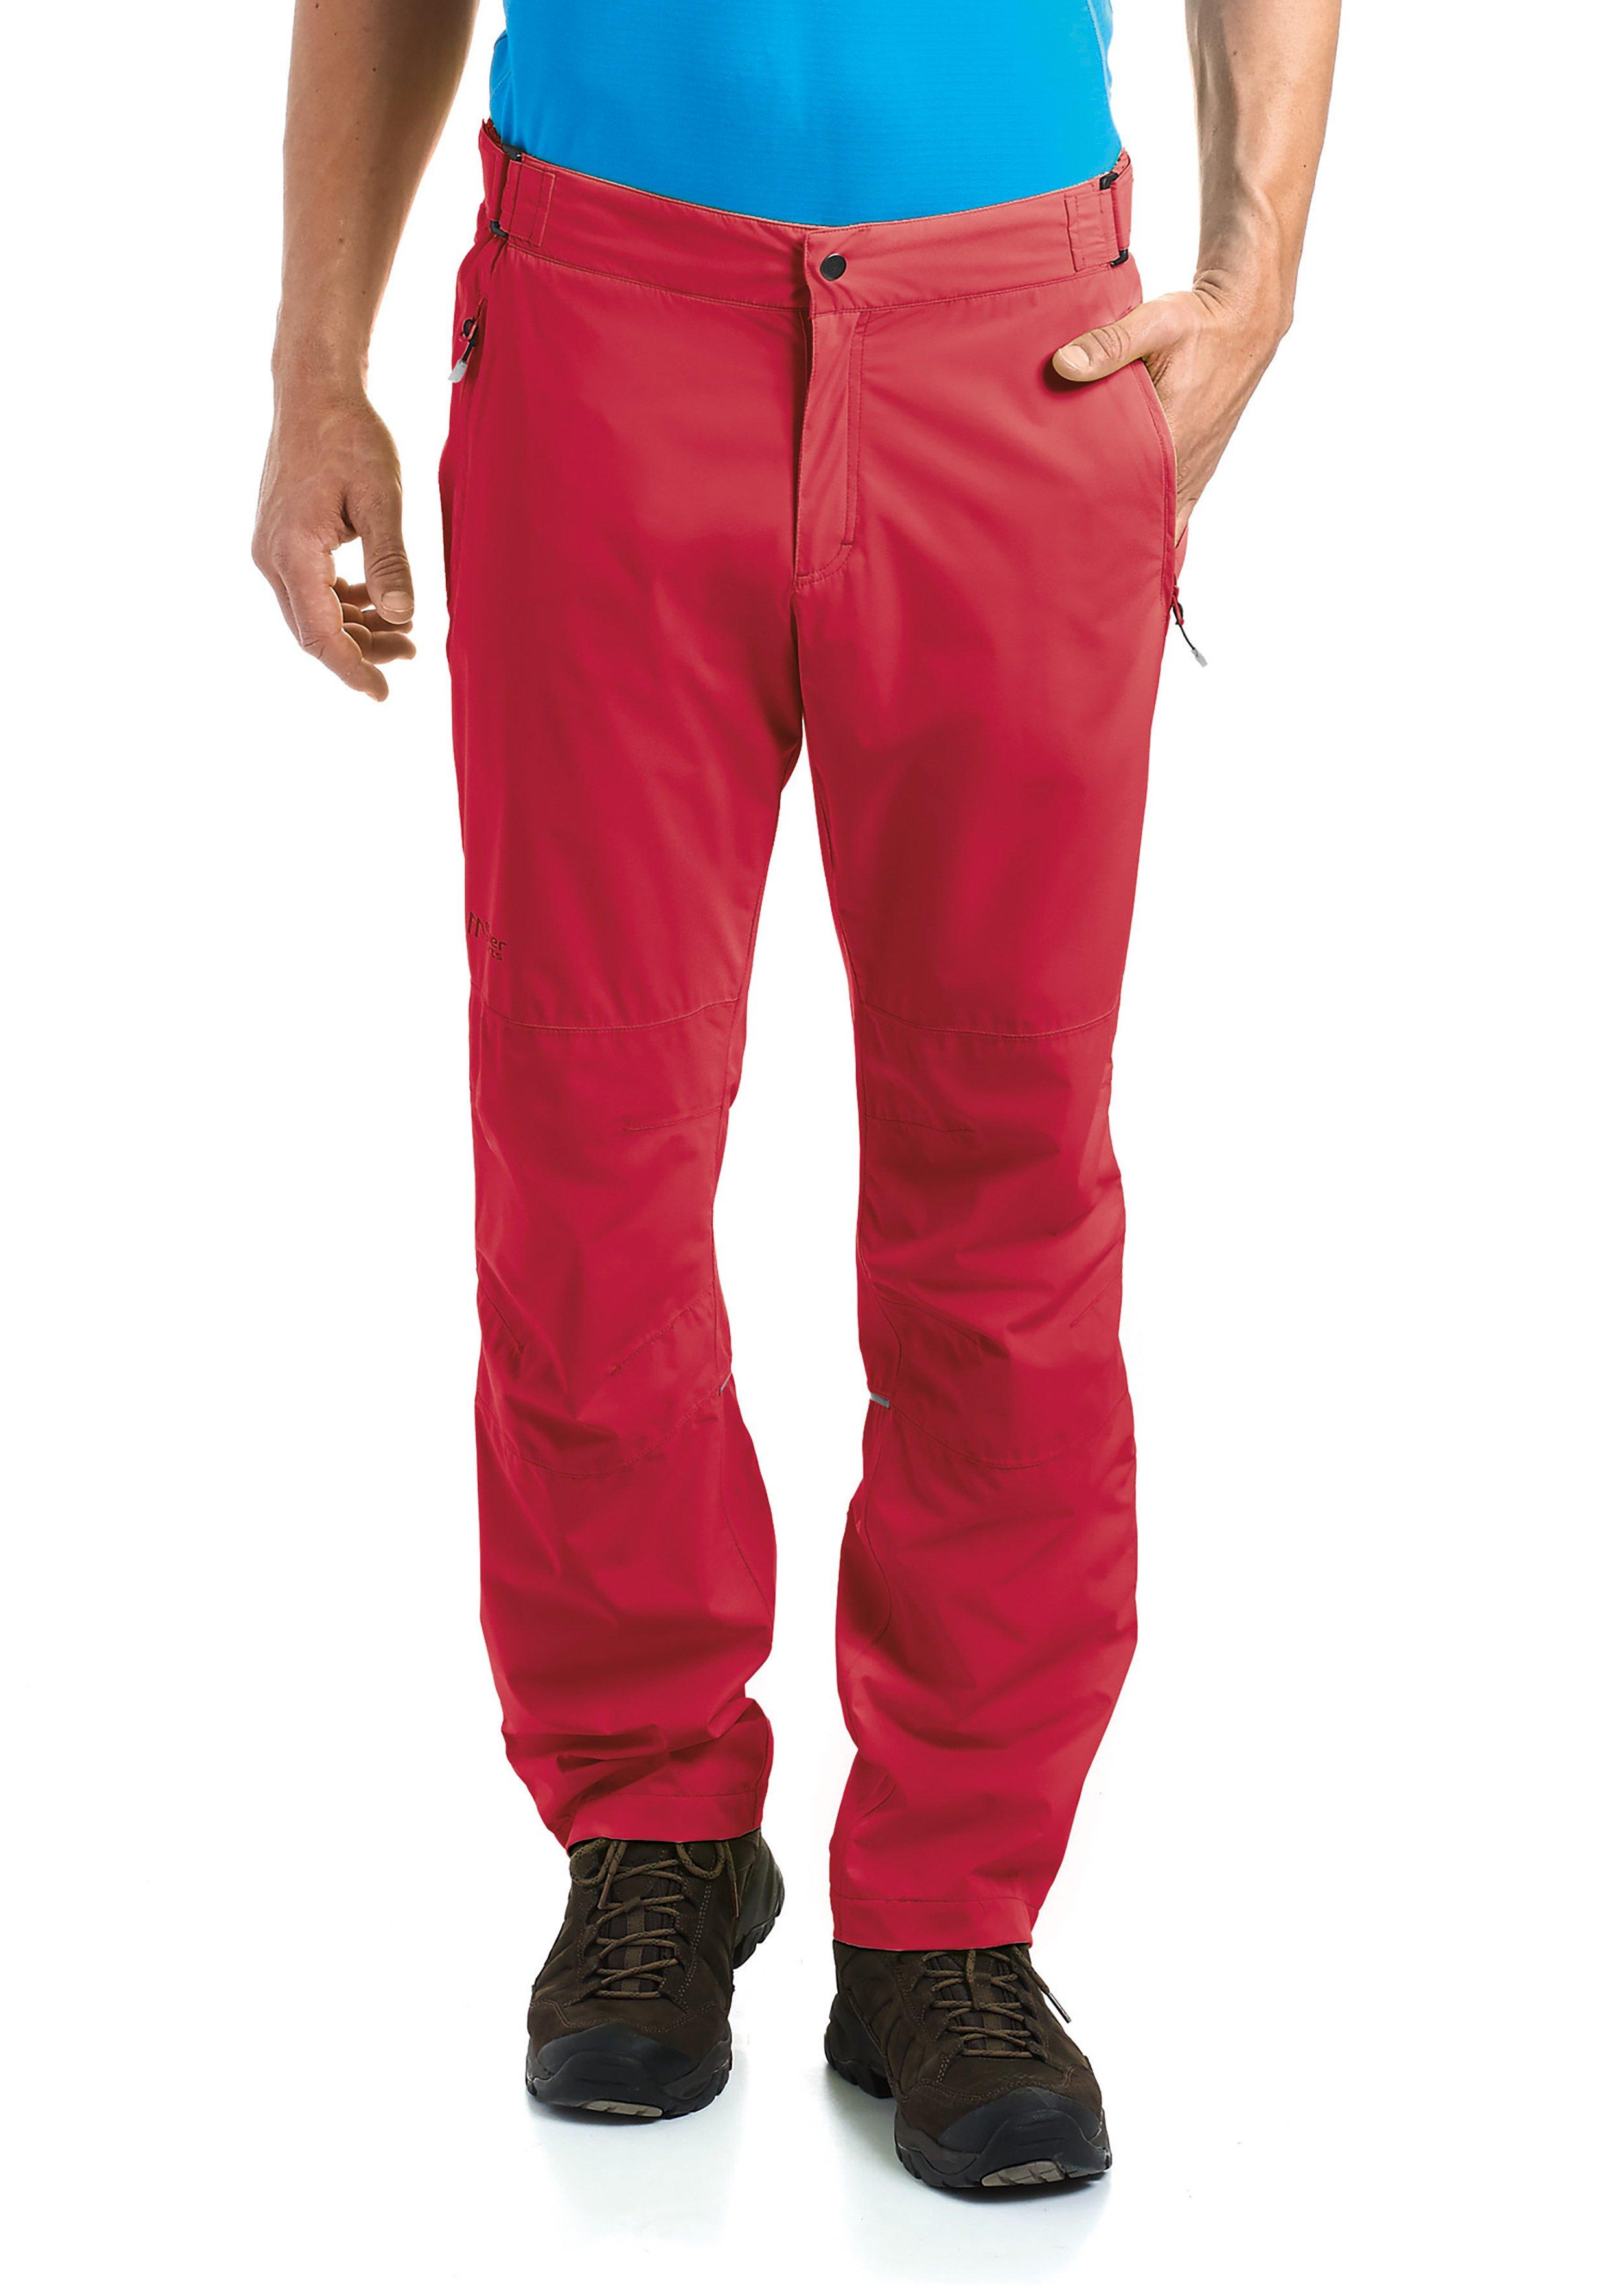 Maier Sports Regenhose Raindrop M | Sportbekleidung > Sporthosen > Sonstige Sporthosen | maier sports